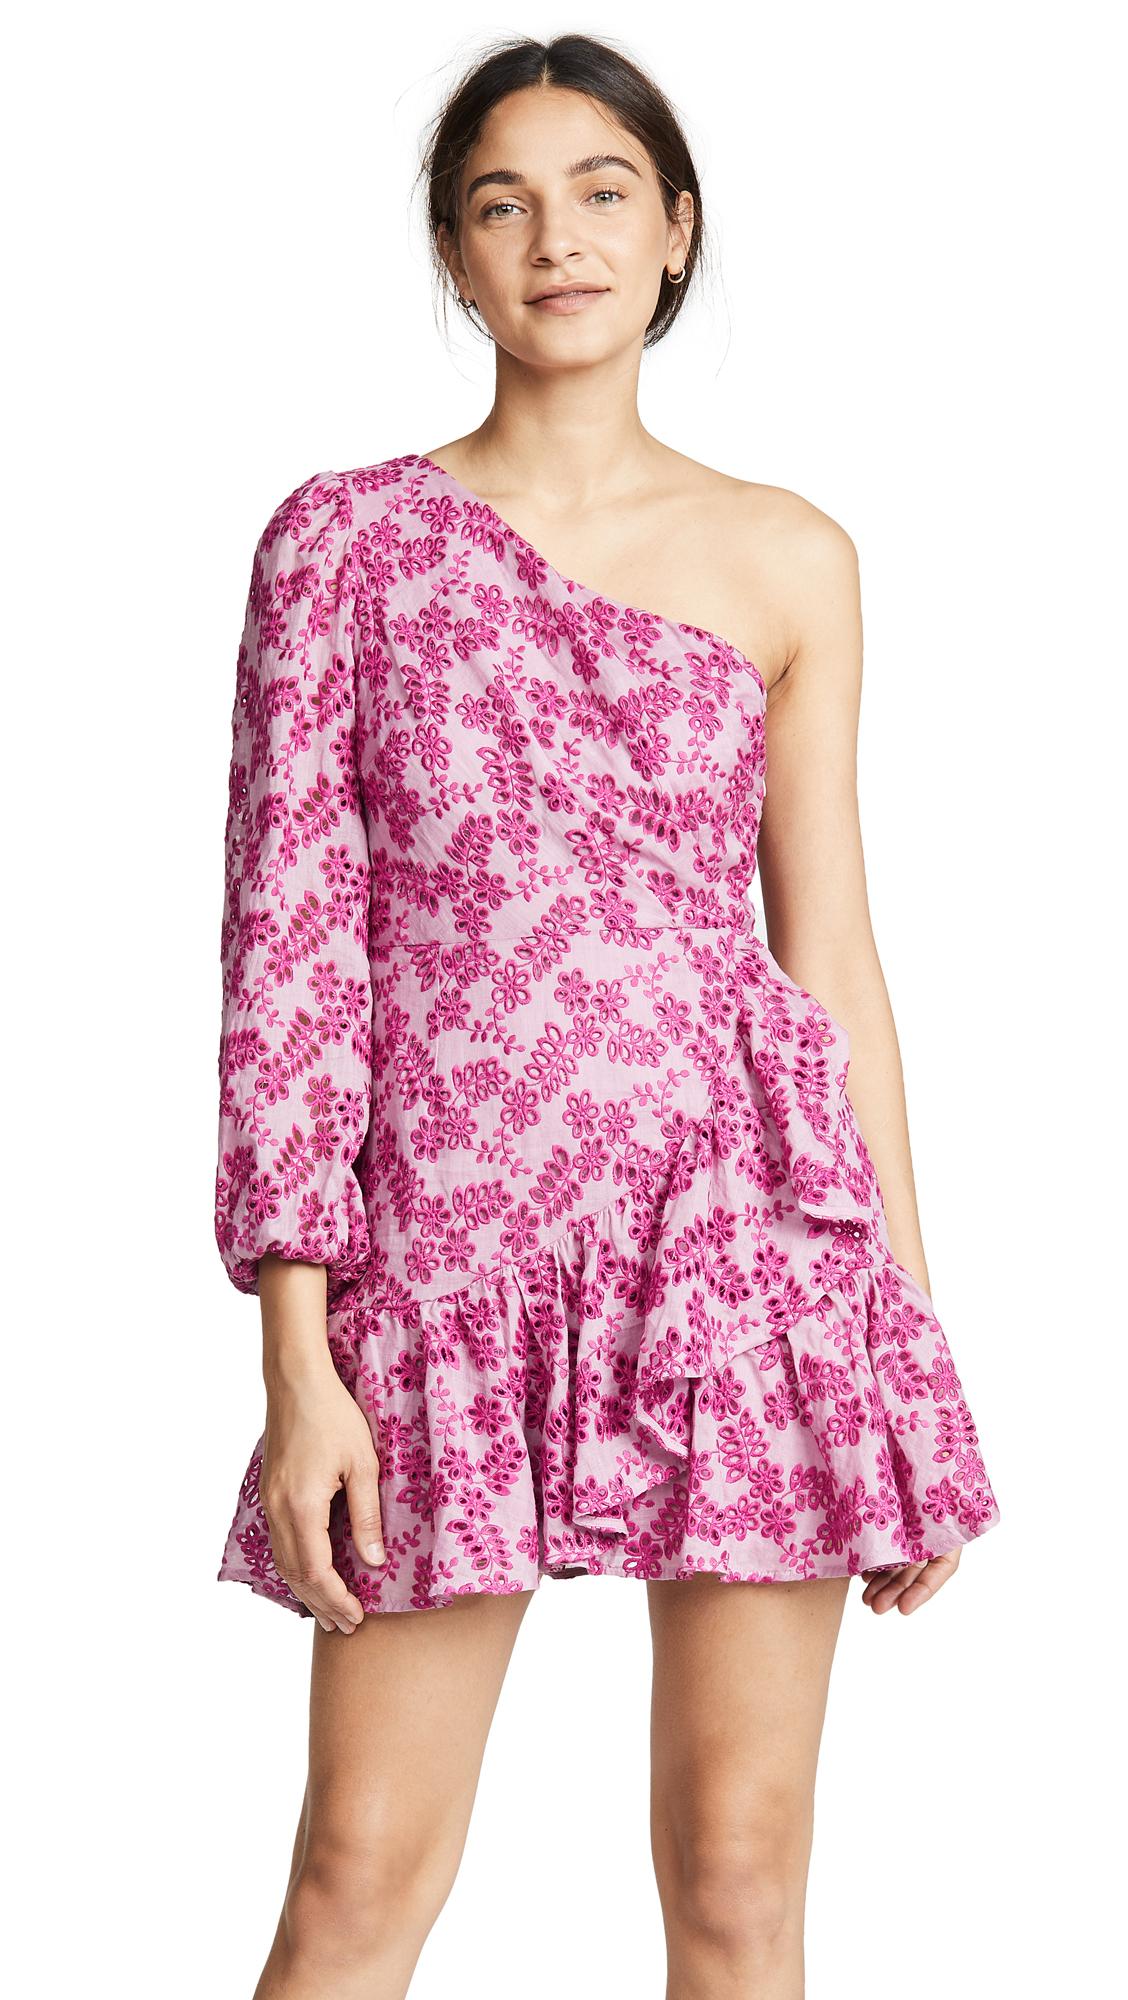 La Maison Talulah Aurora Mini Dress In Antique Rose